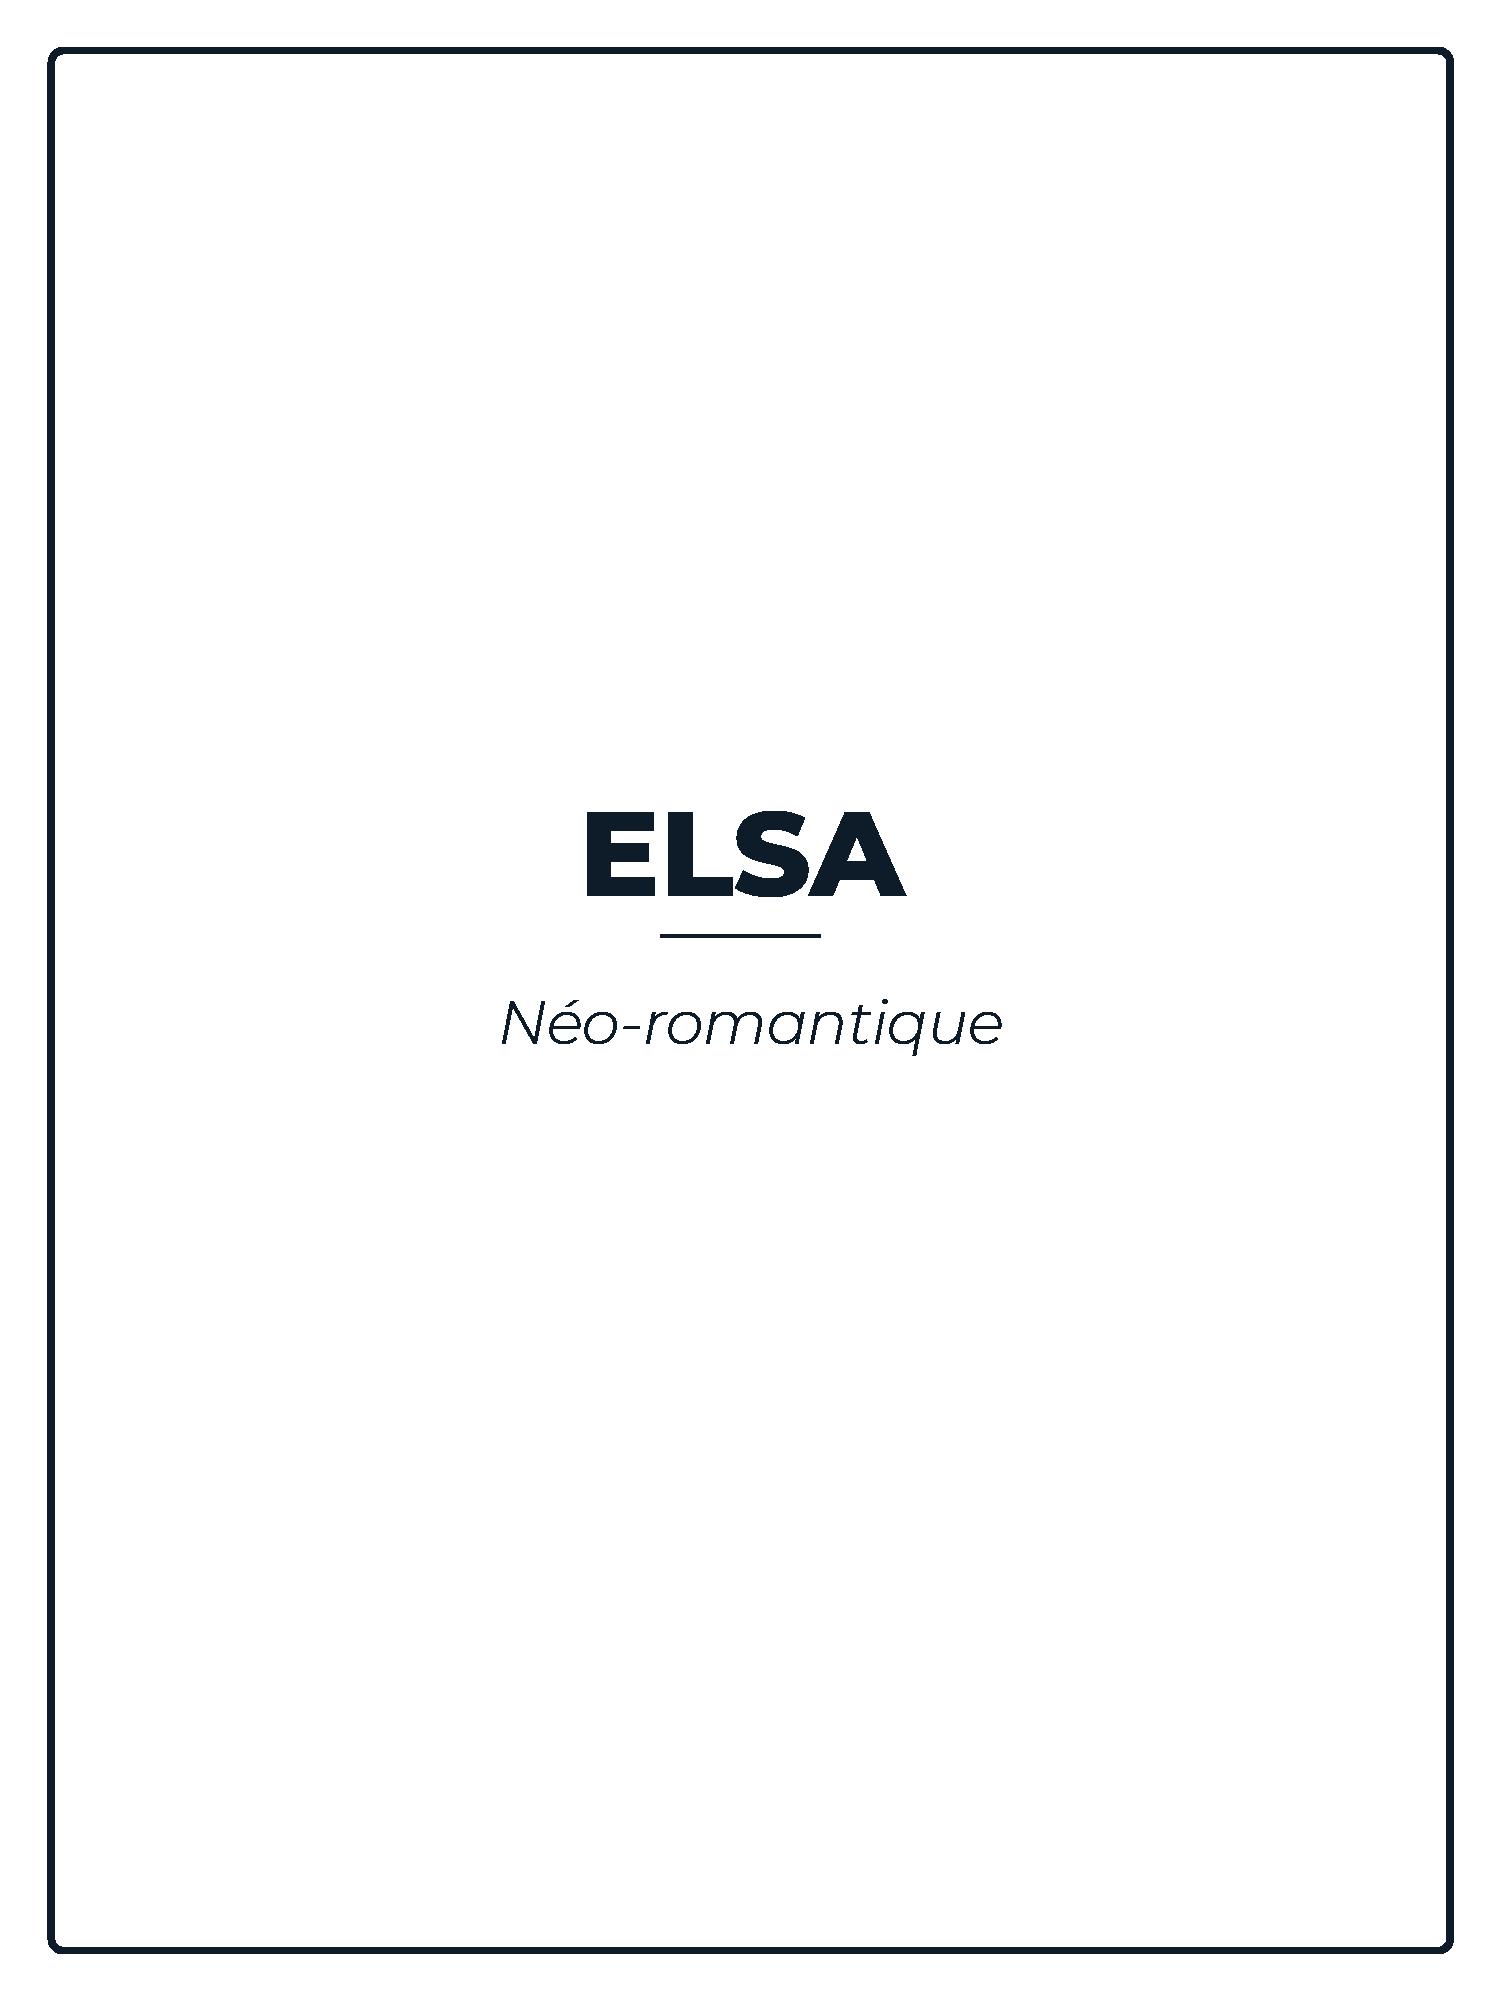 ELSA-PARFUM